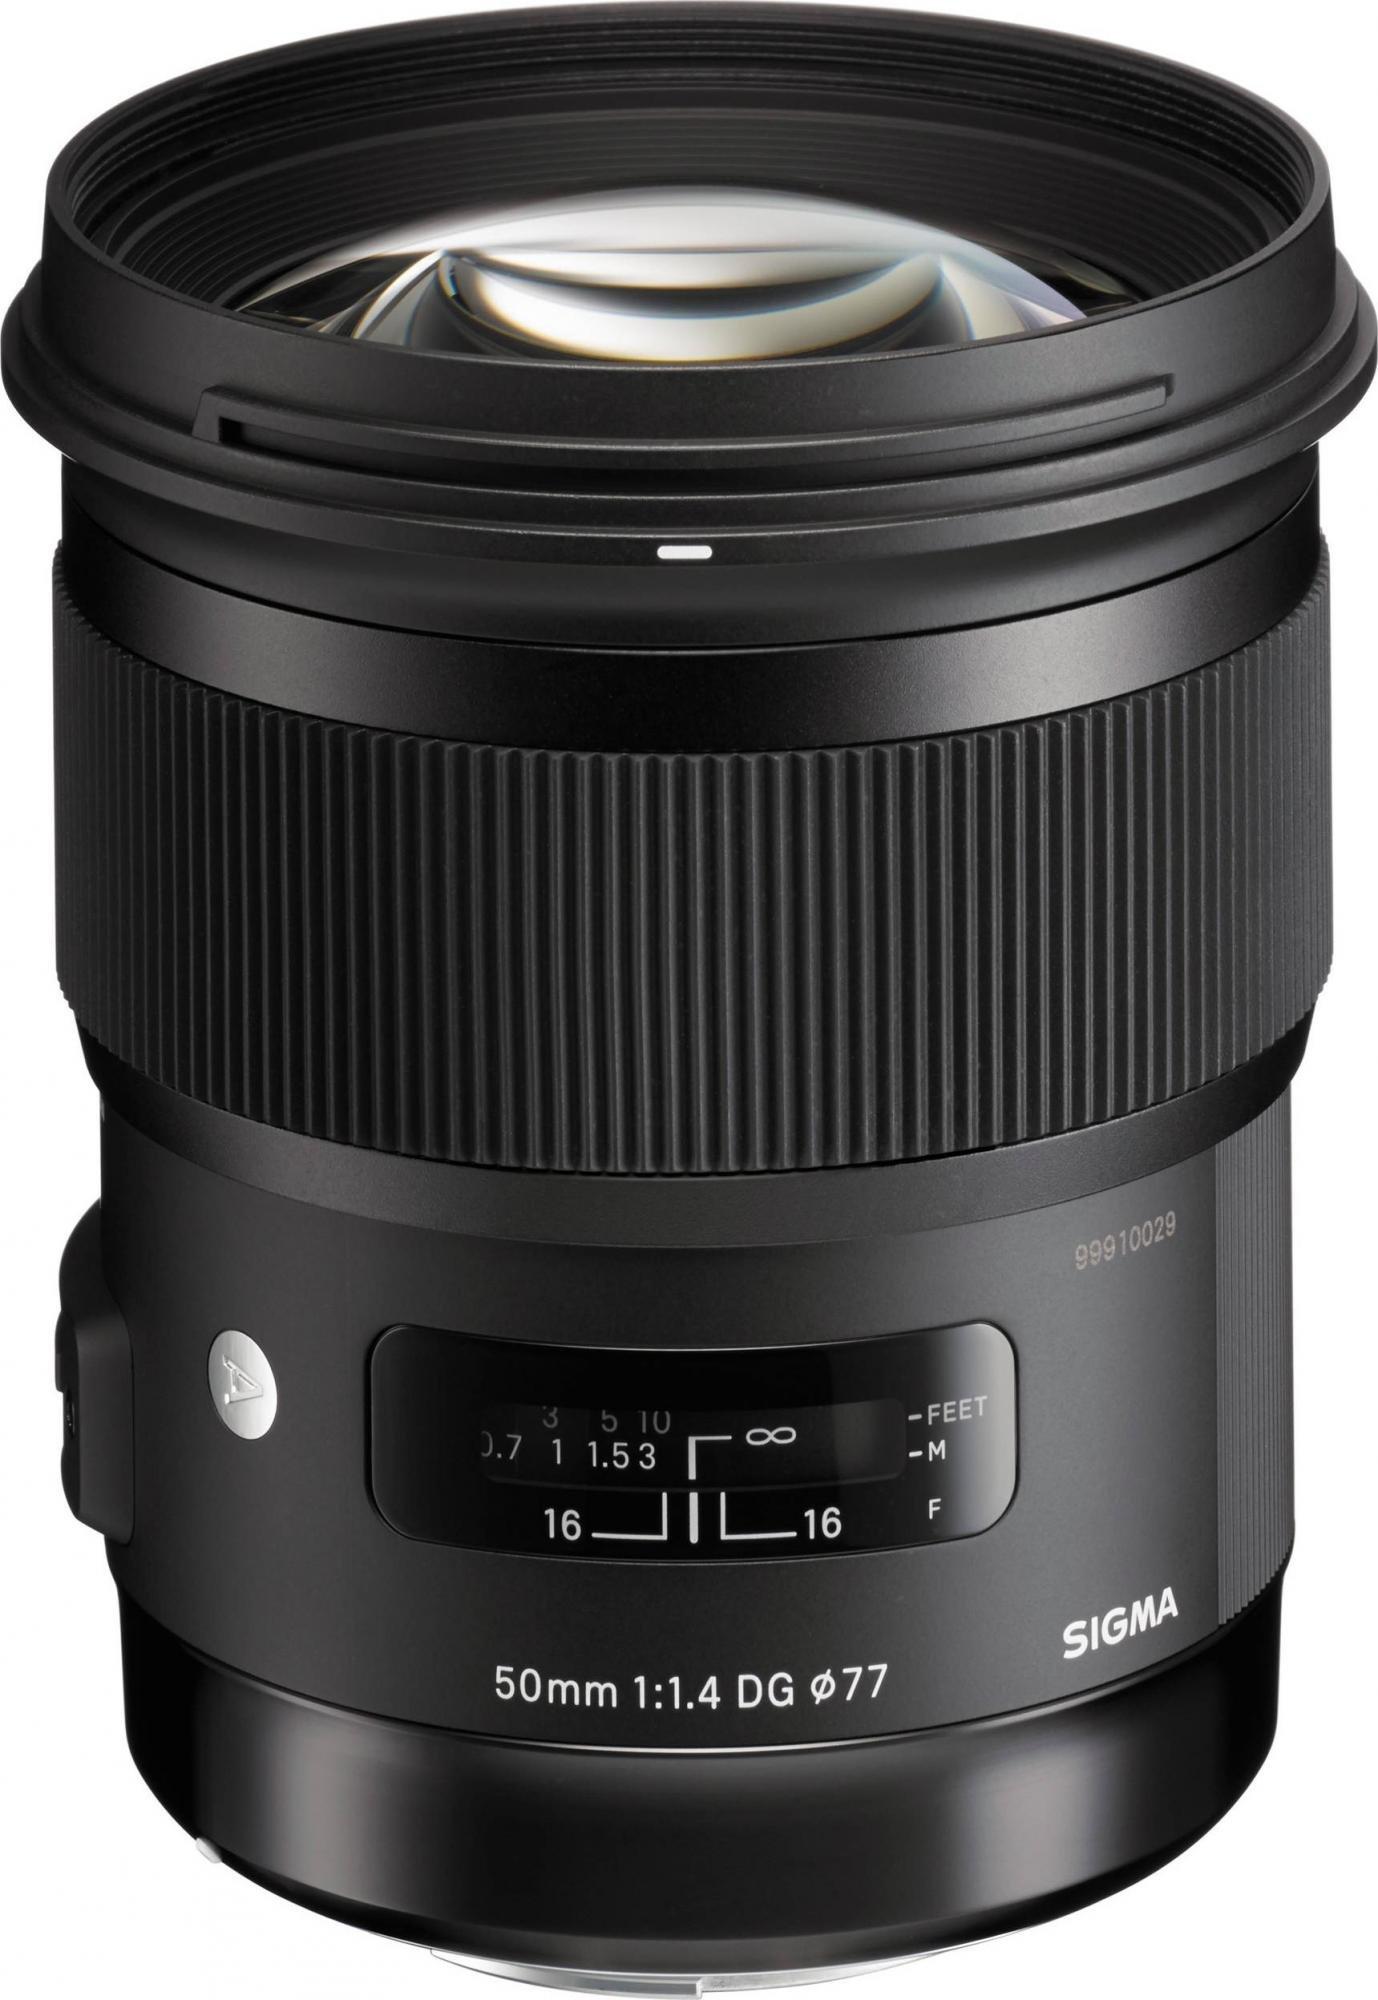 Sigma 50mm f/1,4 DG HSM Art Canon